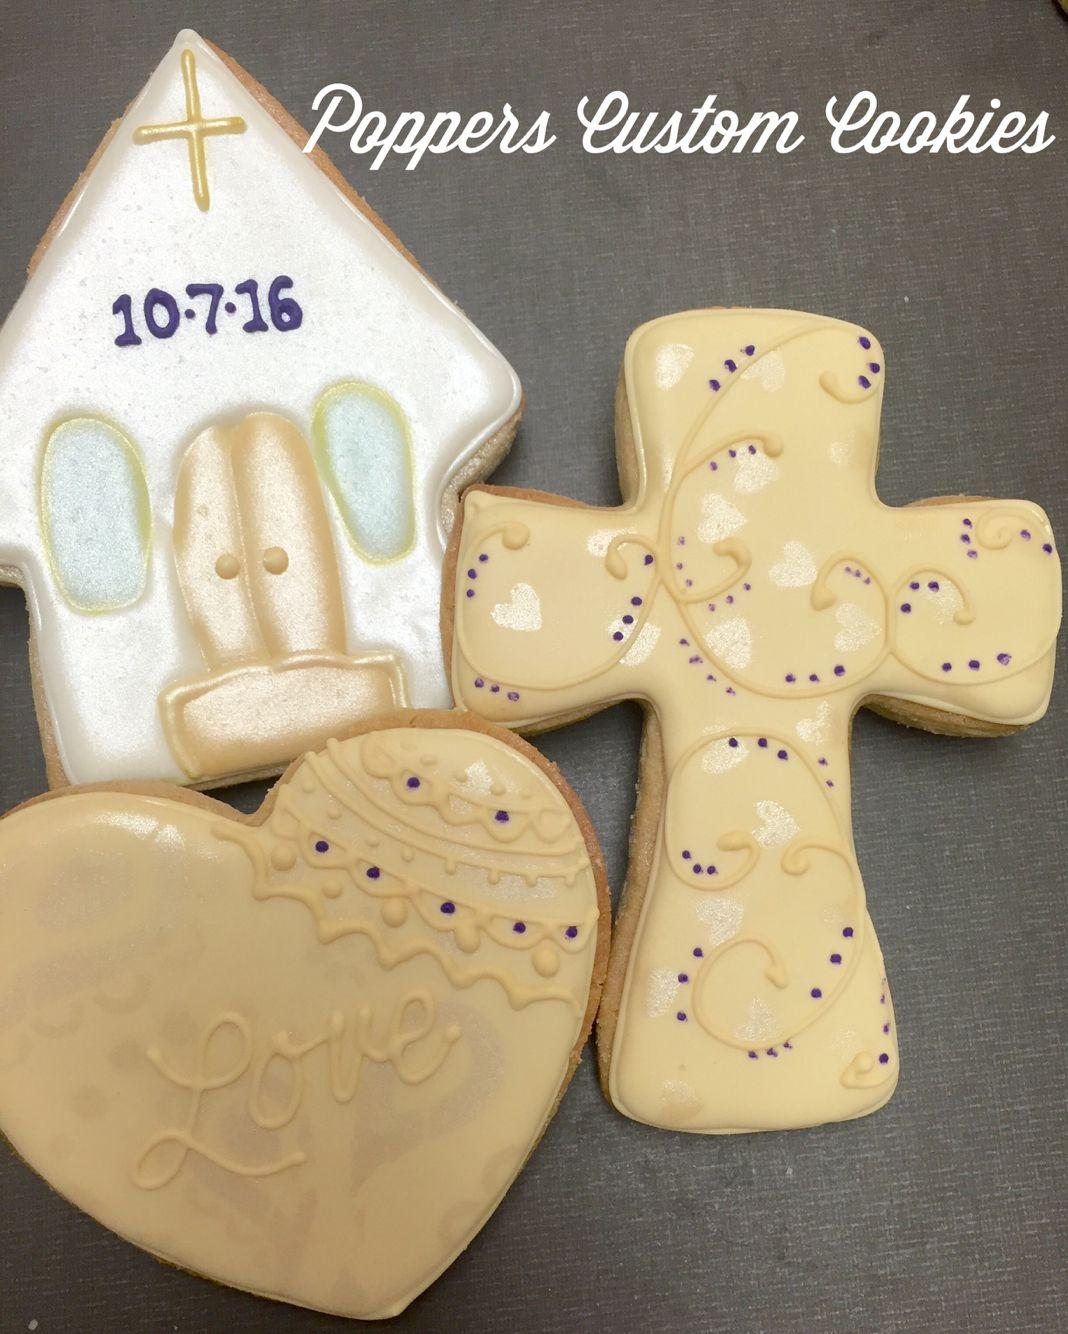 DECORATED COOKIES Cookie decorating, Cookies, Cake pops